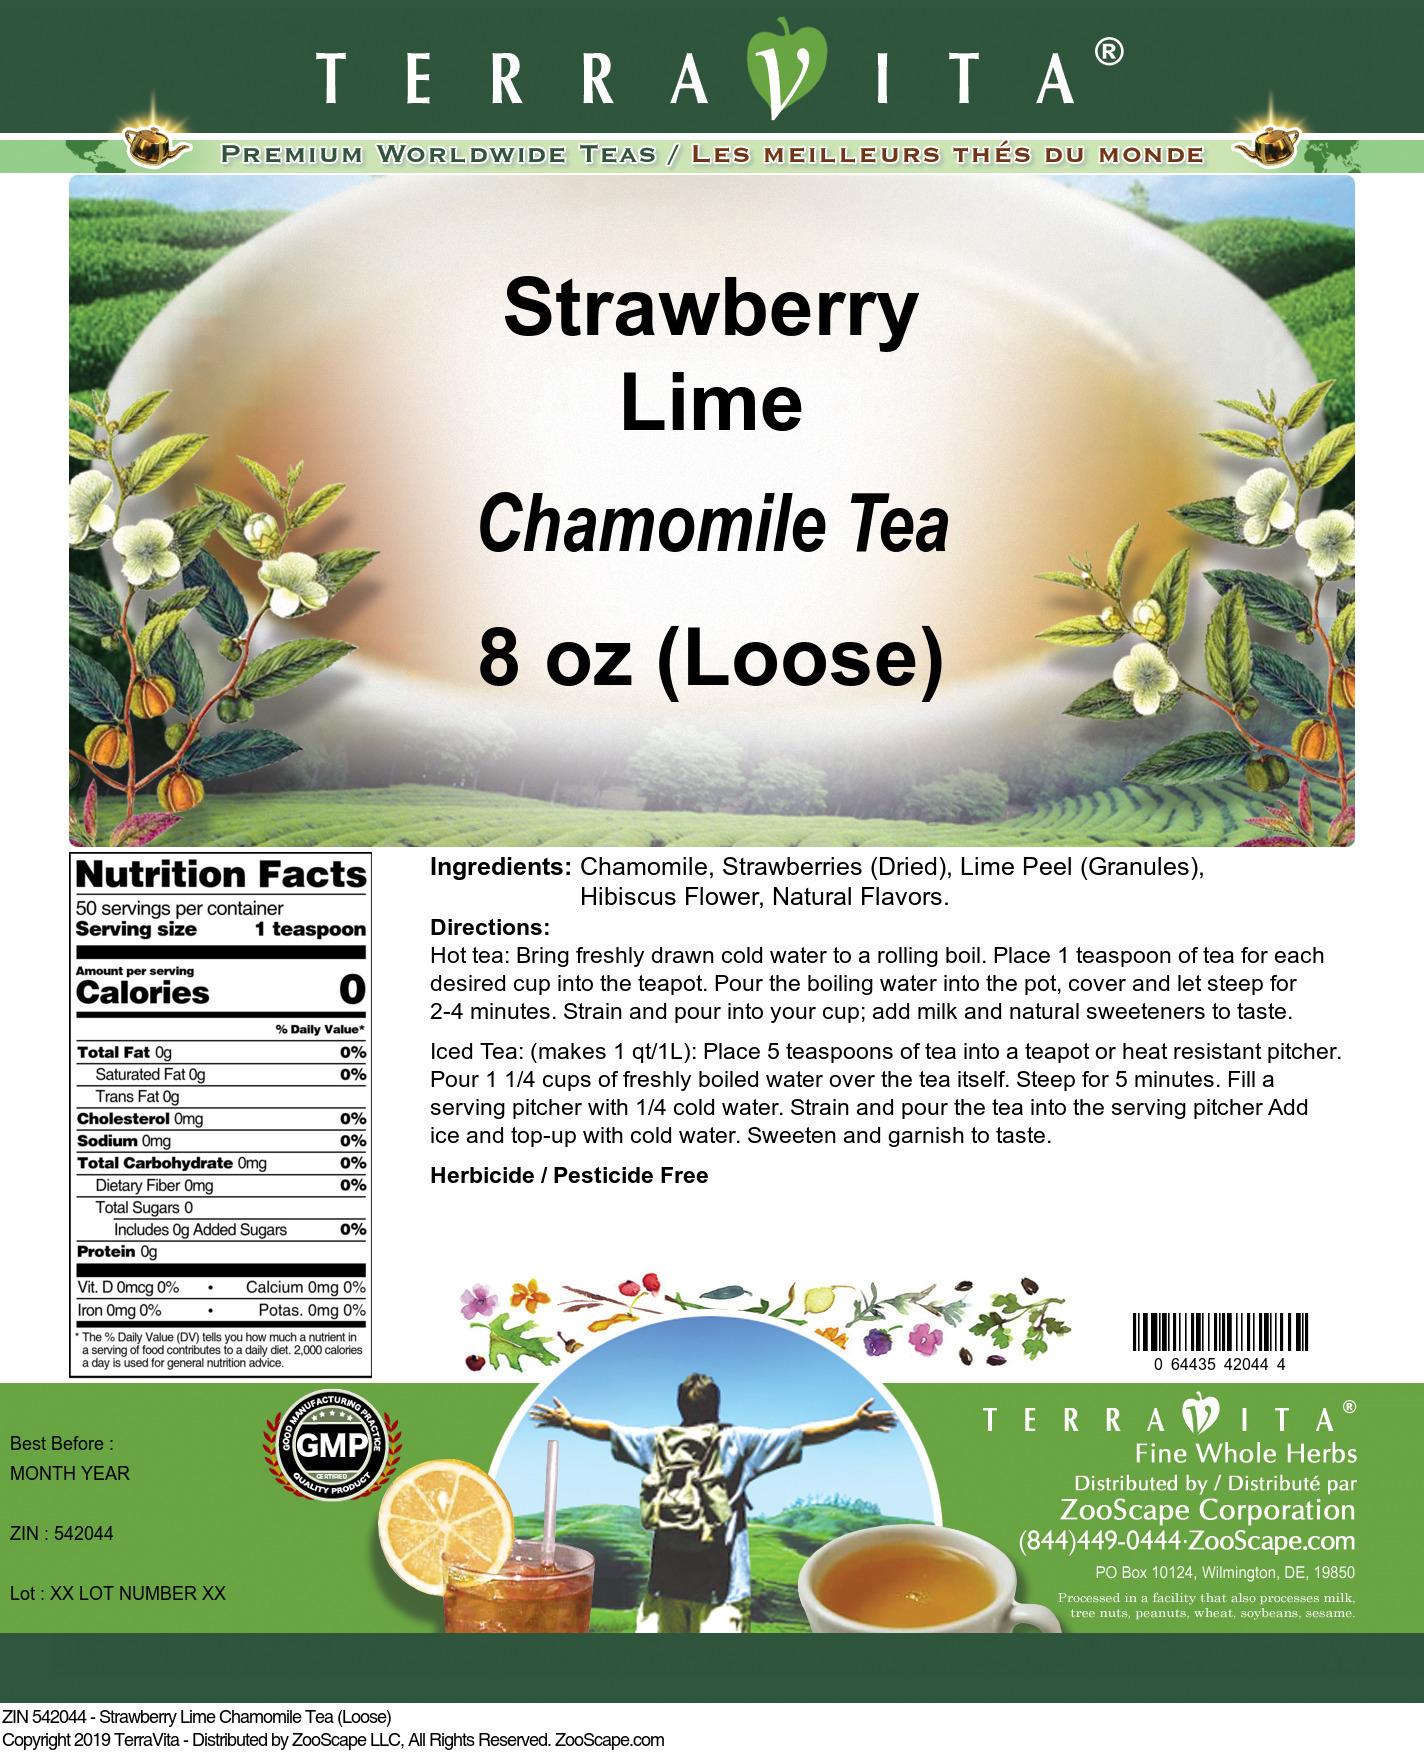 Strawberry Lime Chamomile Tea (Loose)